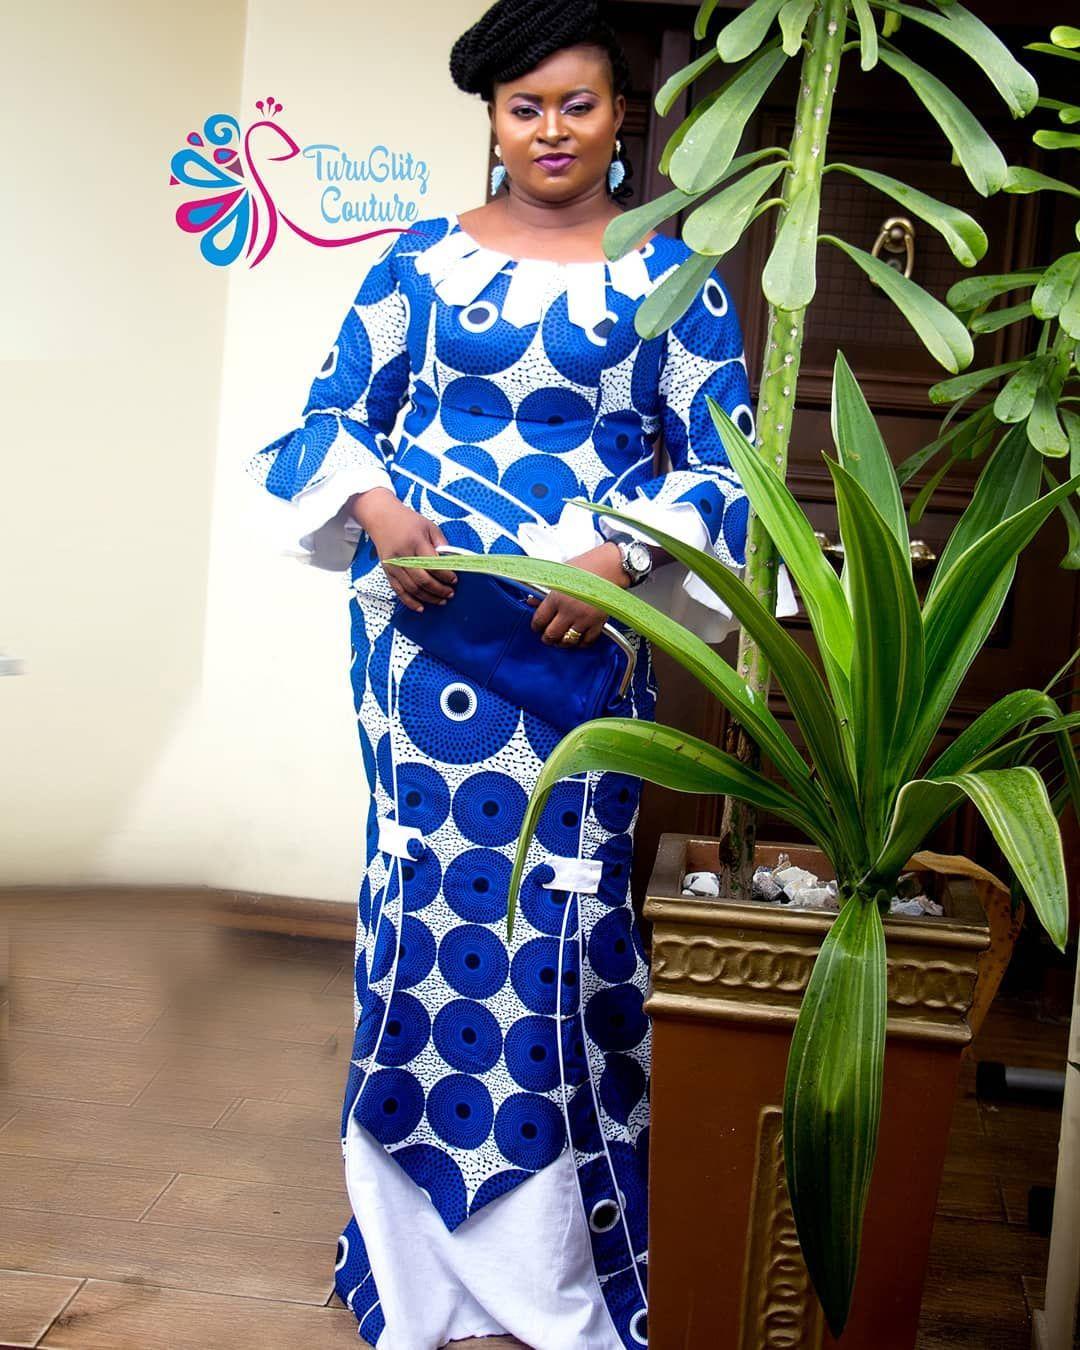 Always  available to support in your wardrobe challenges. #ankaraskirtandblouse #portharcourt #phc #phcity #nigerian #nigeria #naijafashion #asoebi #portharcourt #phc #enterpreneur #fashionenterpreneur #nigerianankarastyles #nigerianfashiononline #nigerianfashiondaily #nigerianfashionbloggers #nigerianfasiondaily #9naijafashiongallery #9naijawoman